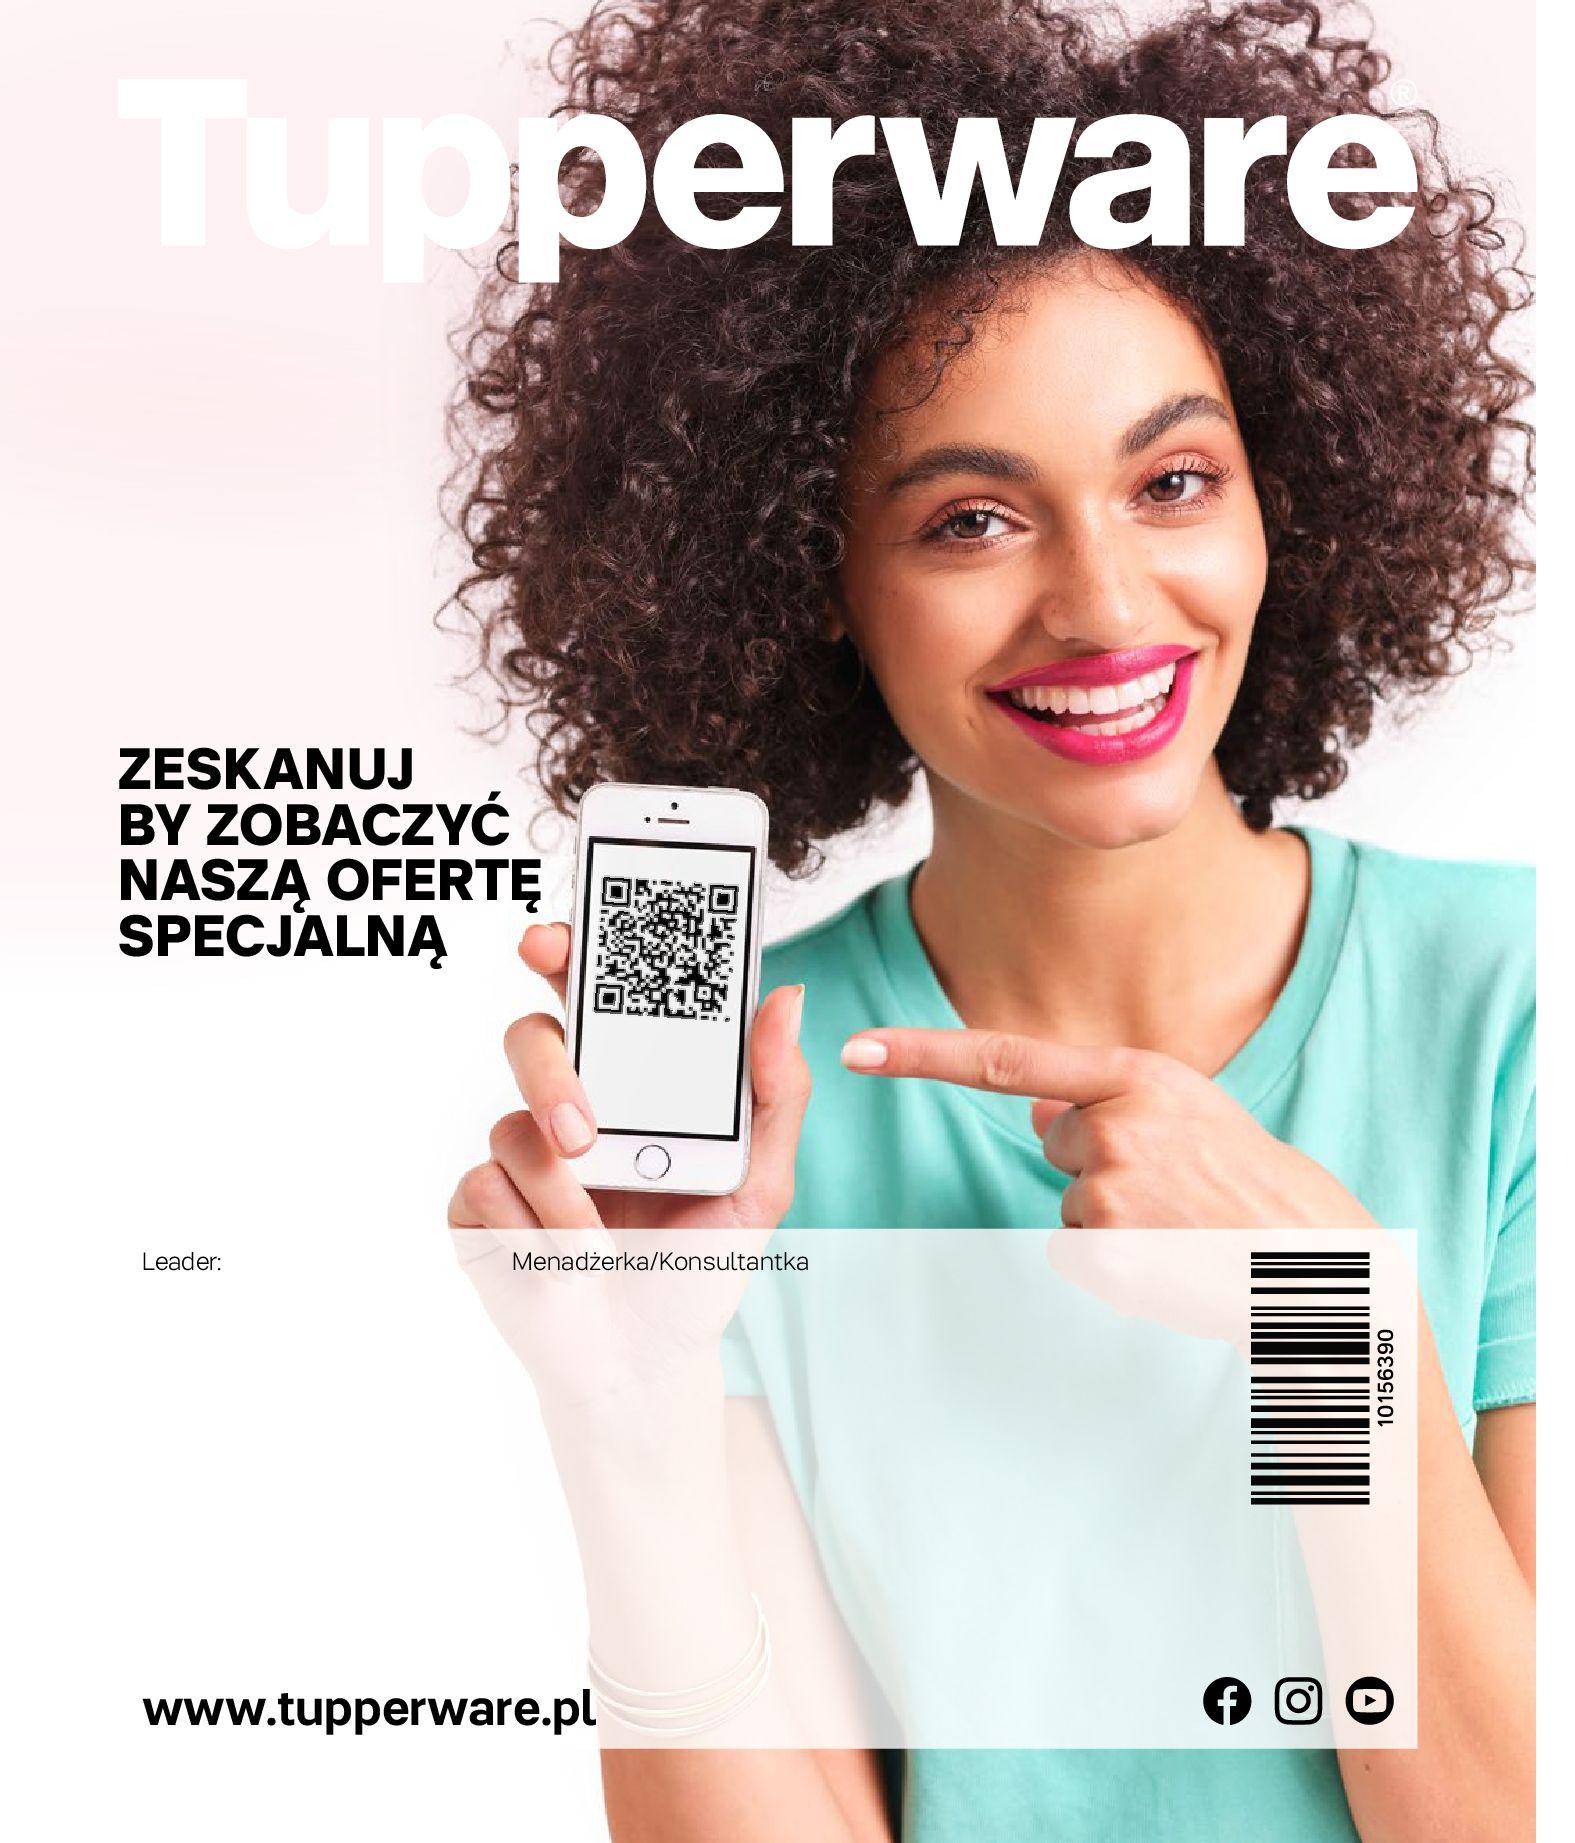 Gazetka Tupperware: Gazetka Tupperware - Katalog wiosna/ lato 2021-05-10 page-64